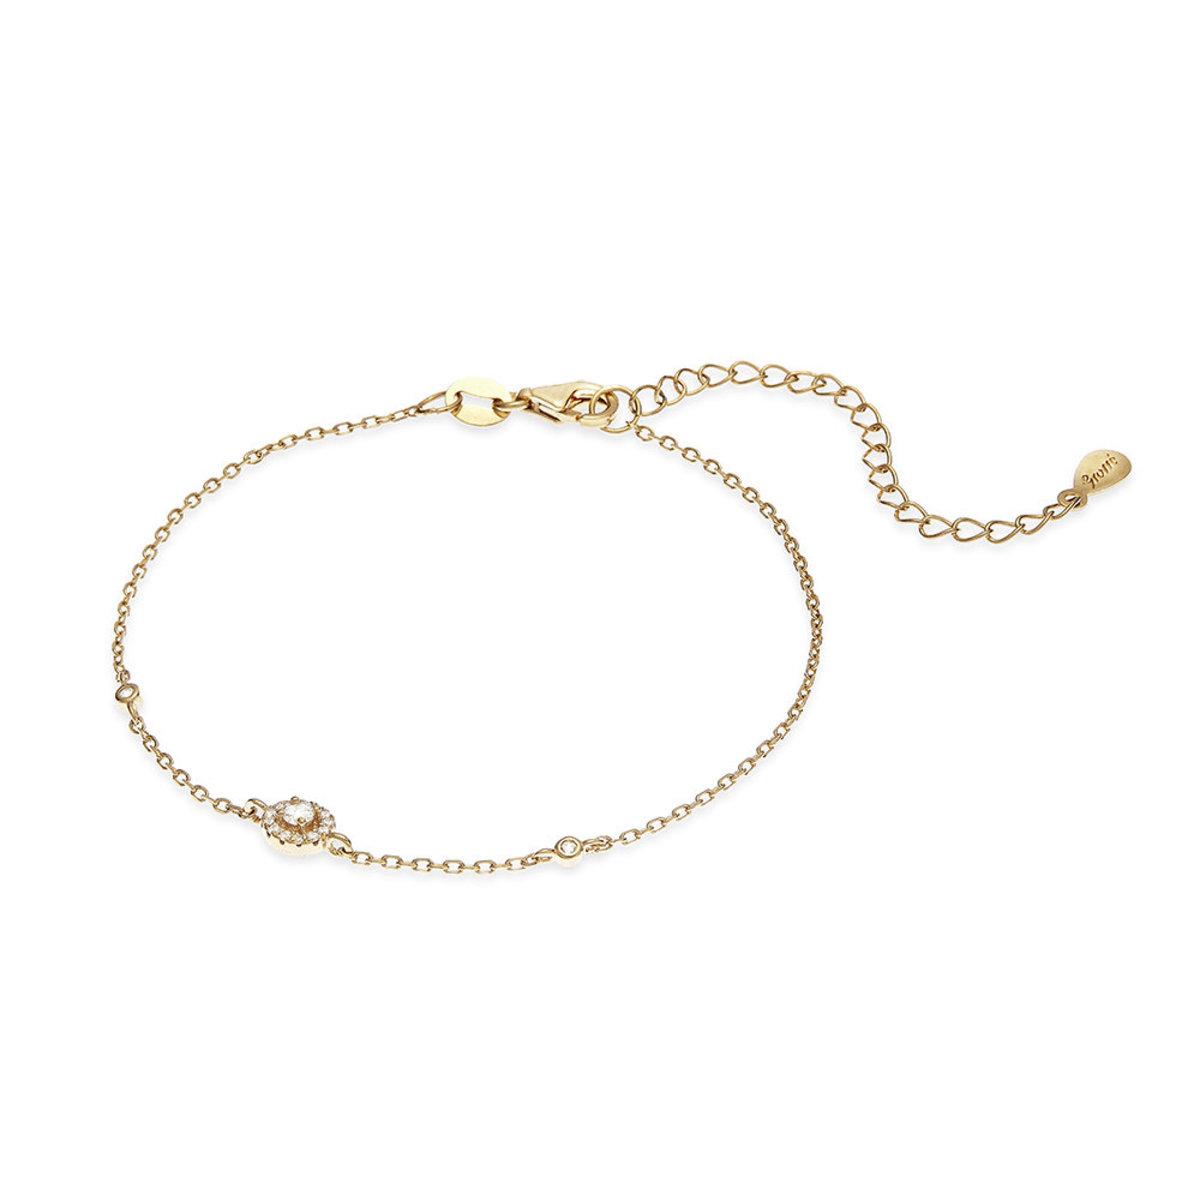 Tresor: 925 silver, gold plating, CZ stone bracelet